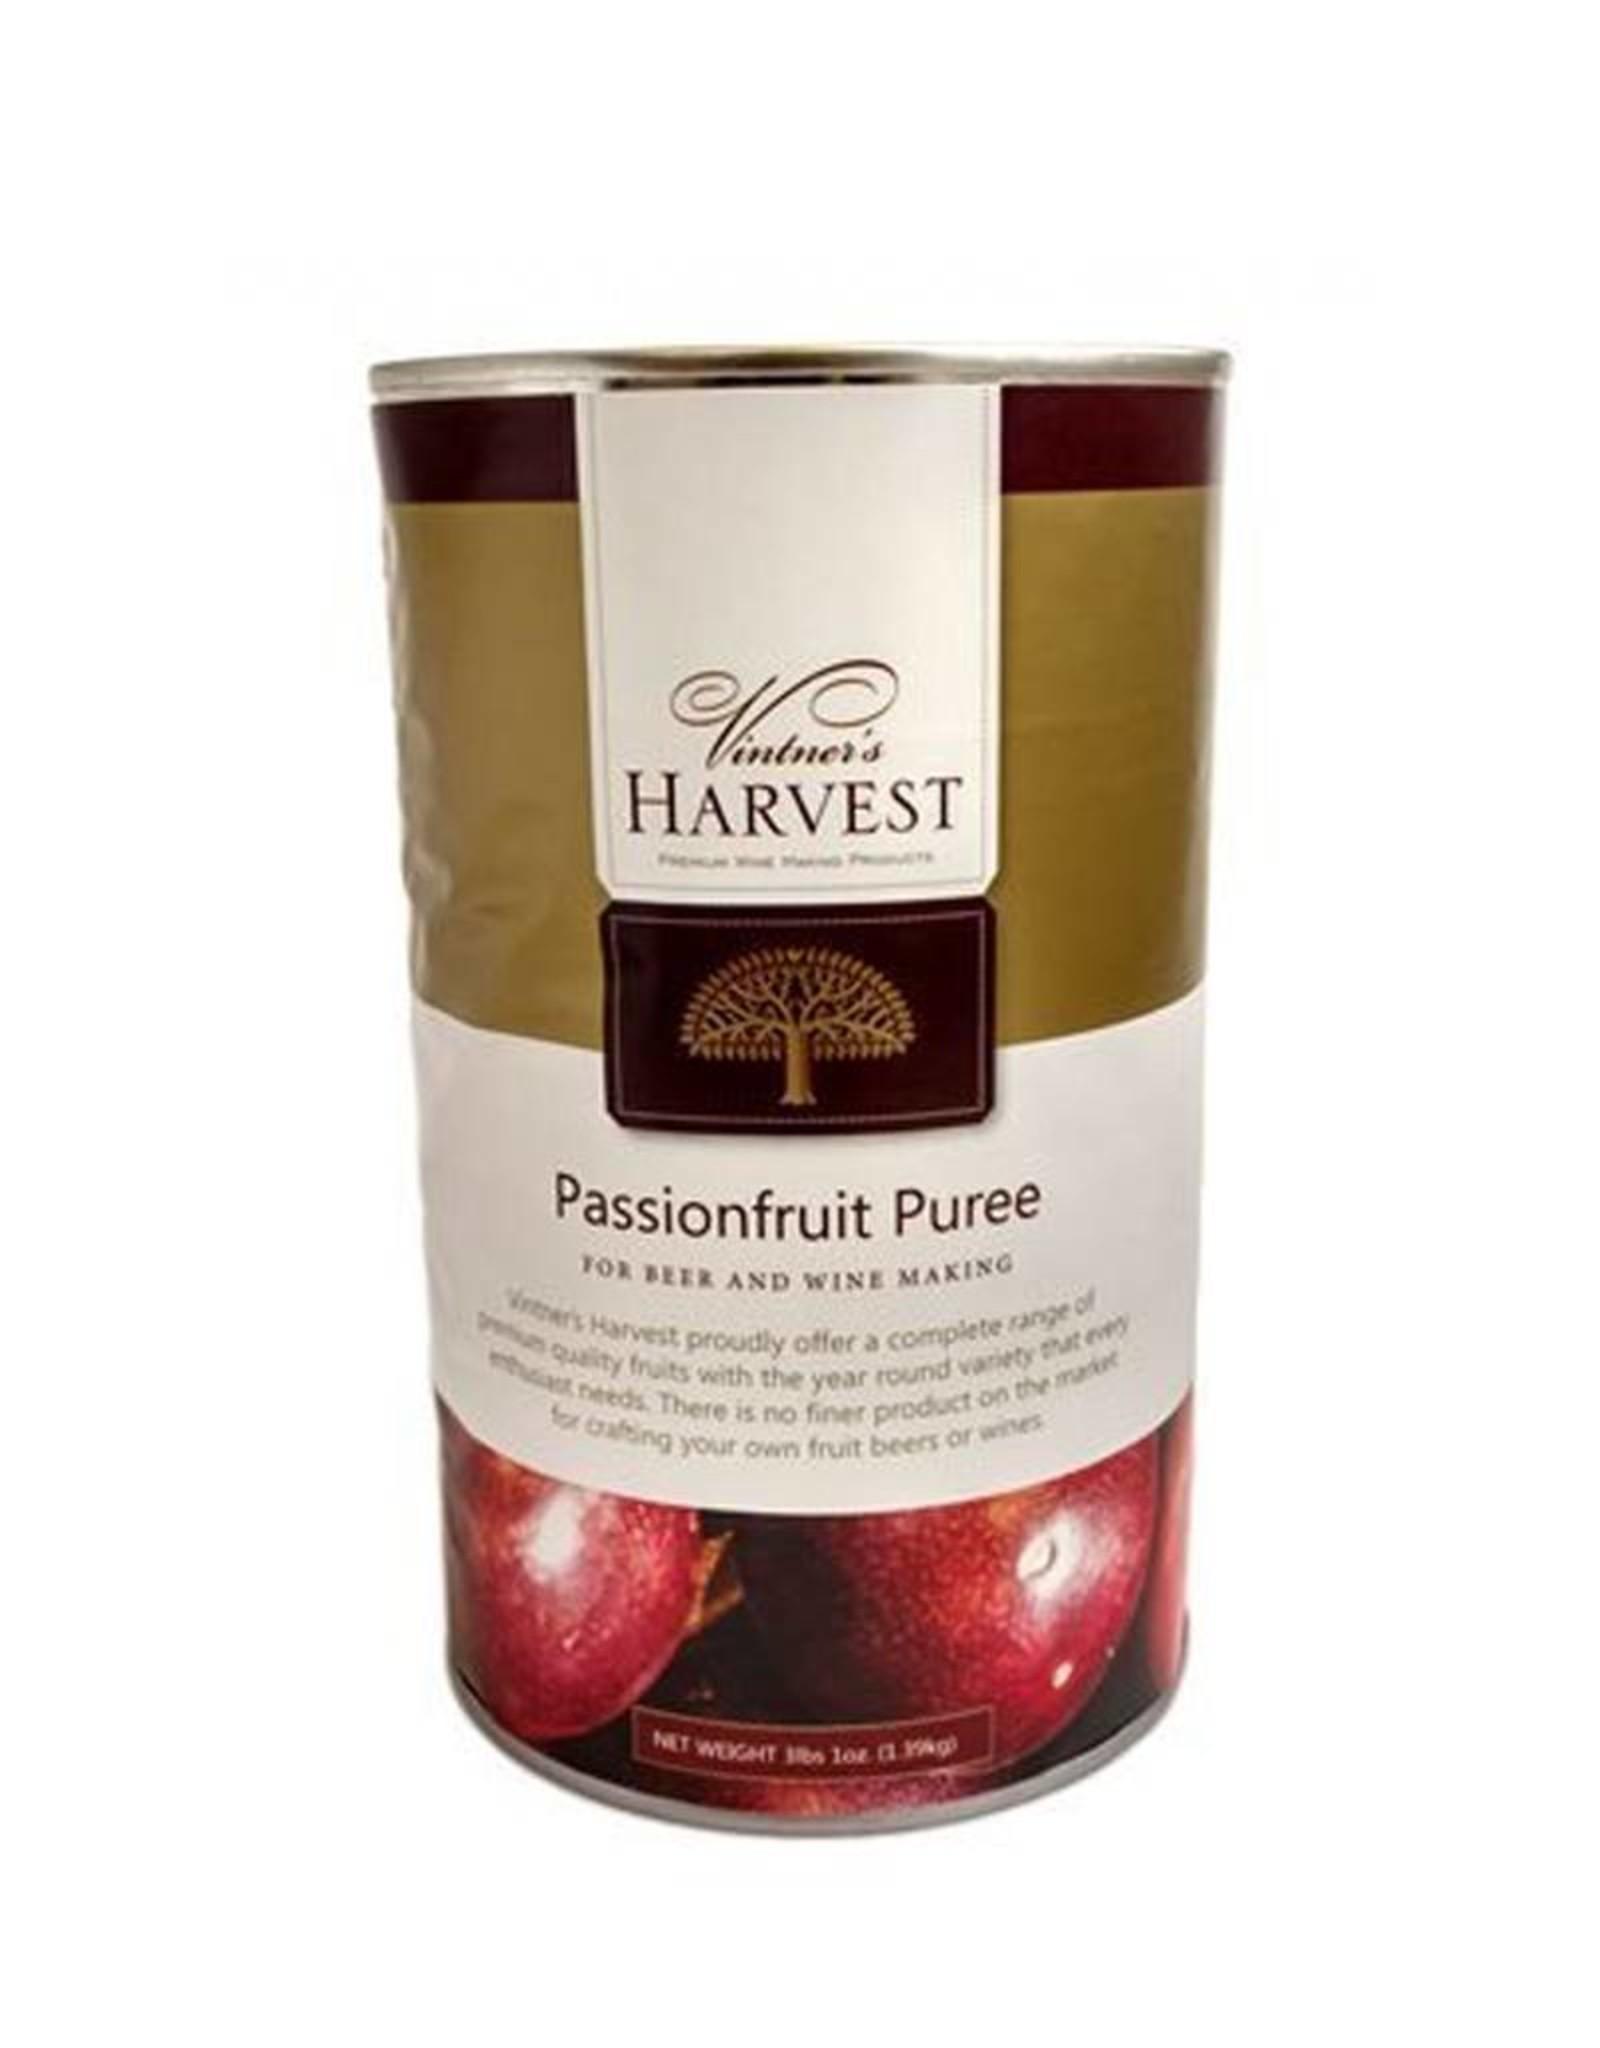 Vintner's Harvest Passionfruit Puree - 49 oz can